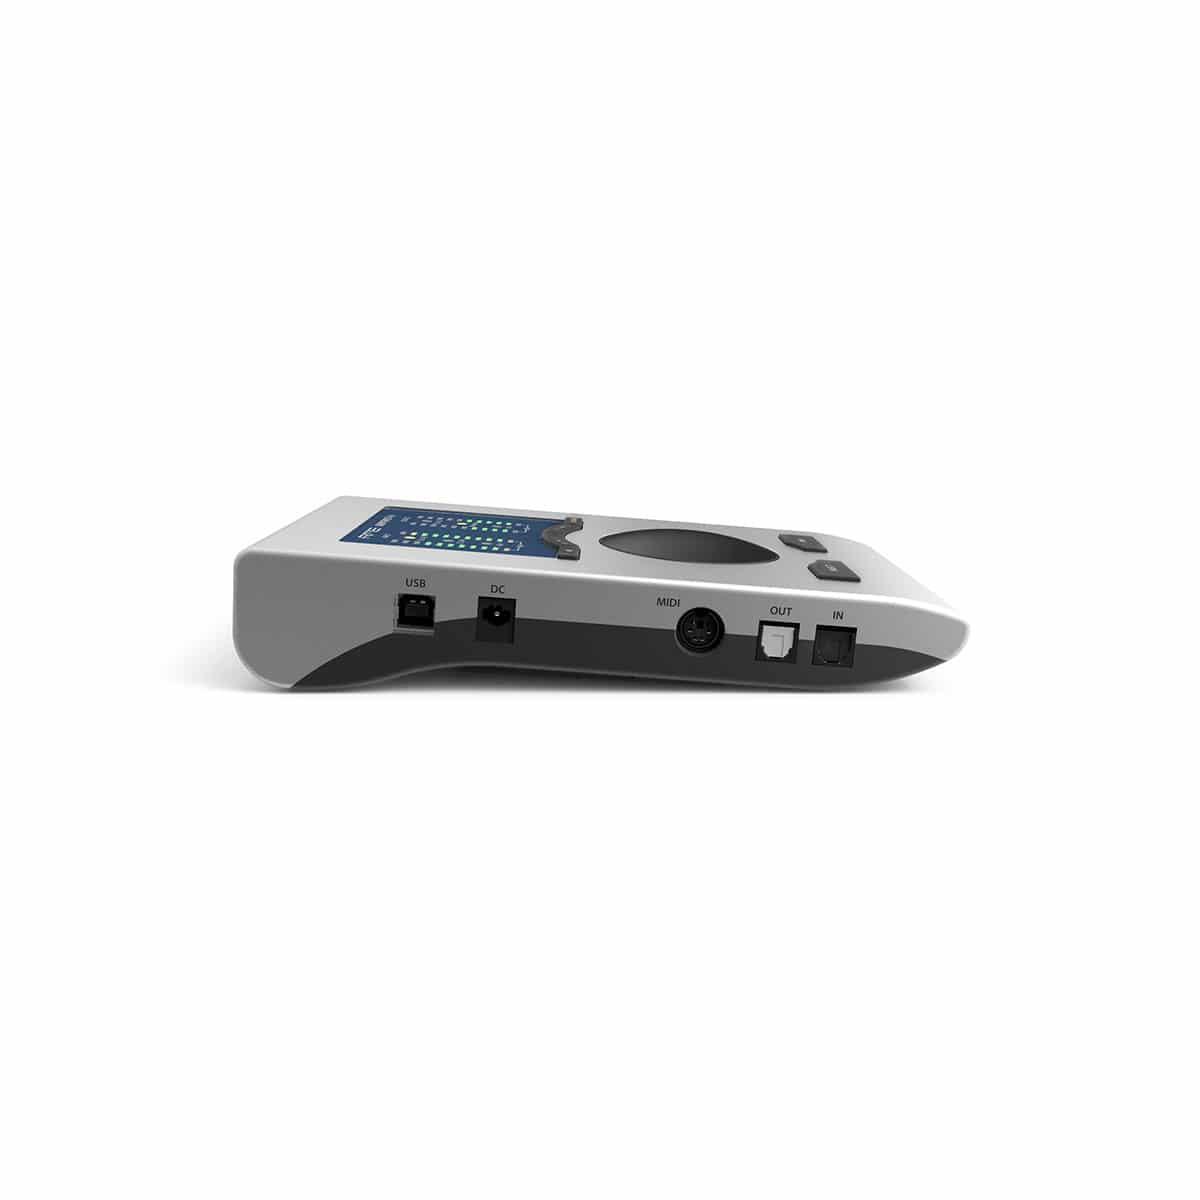 RME Babyface Pro 04 Pro Audio, Audio Digitale, Schede Audio per PC e MAC